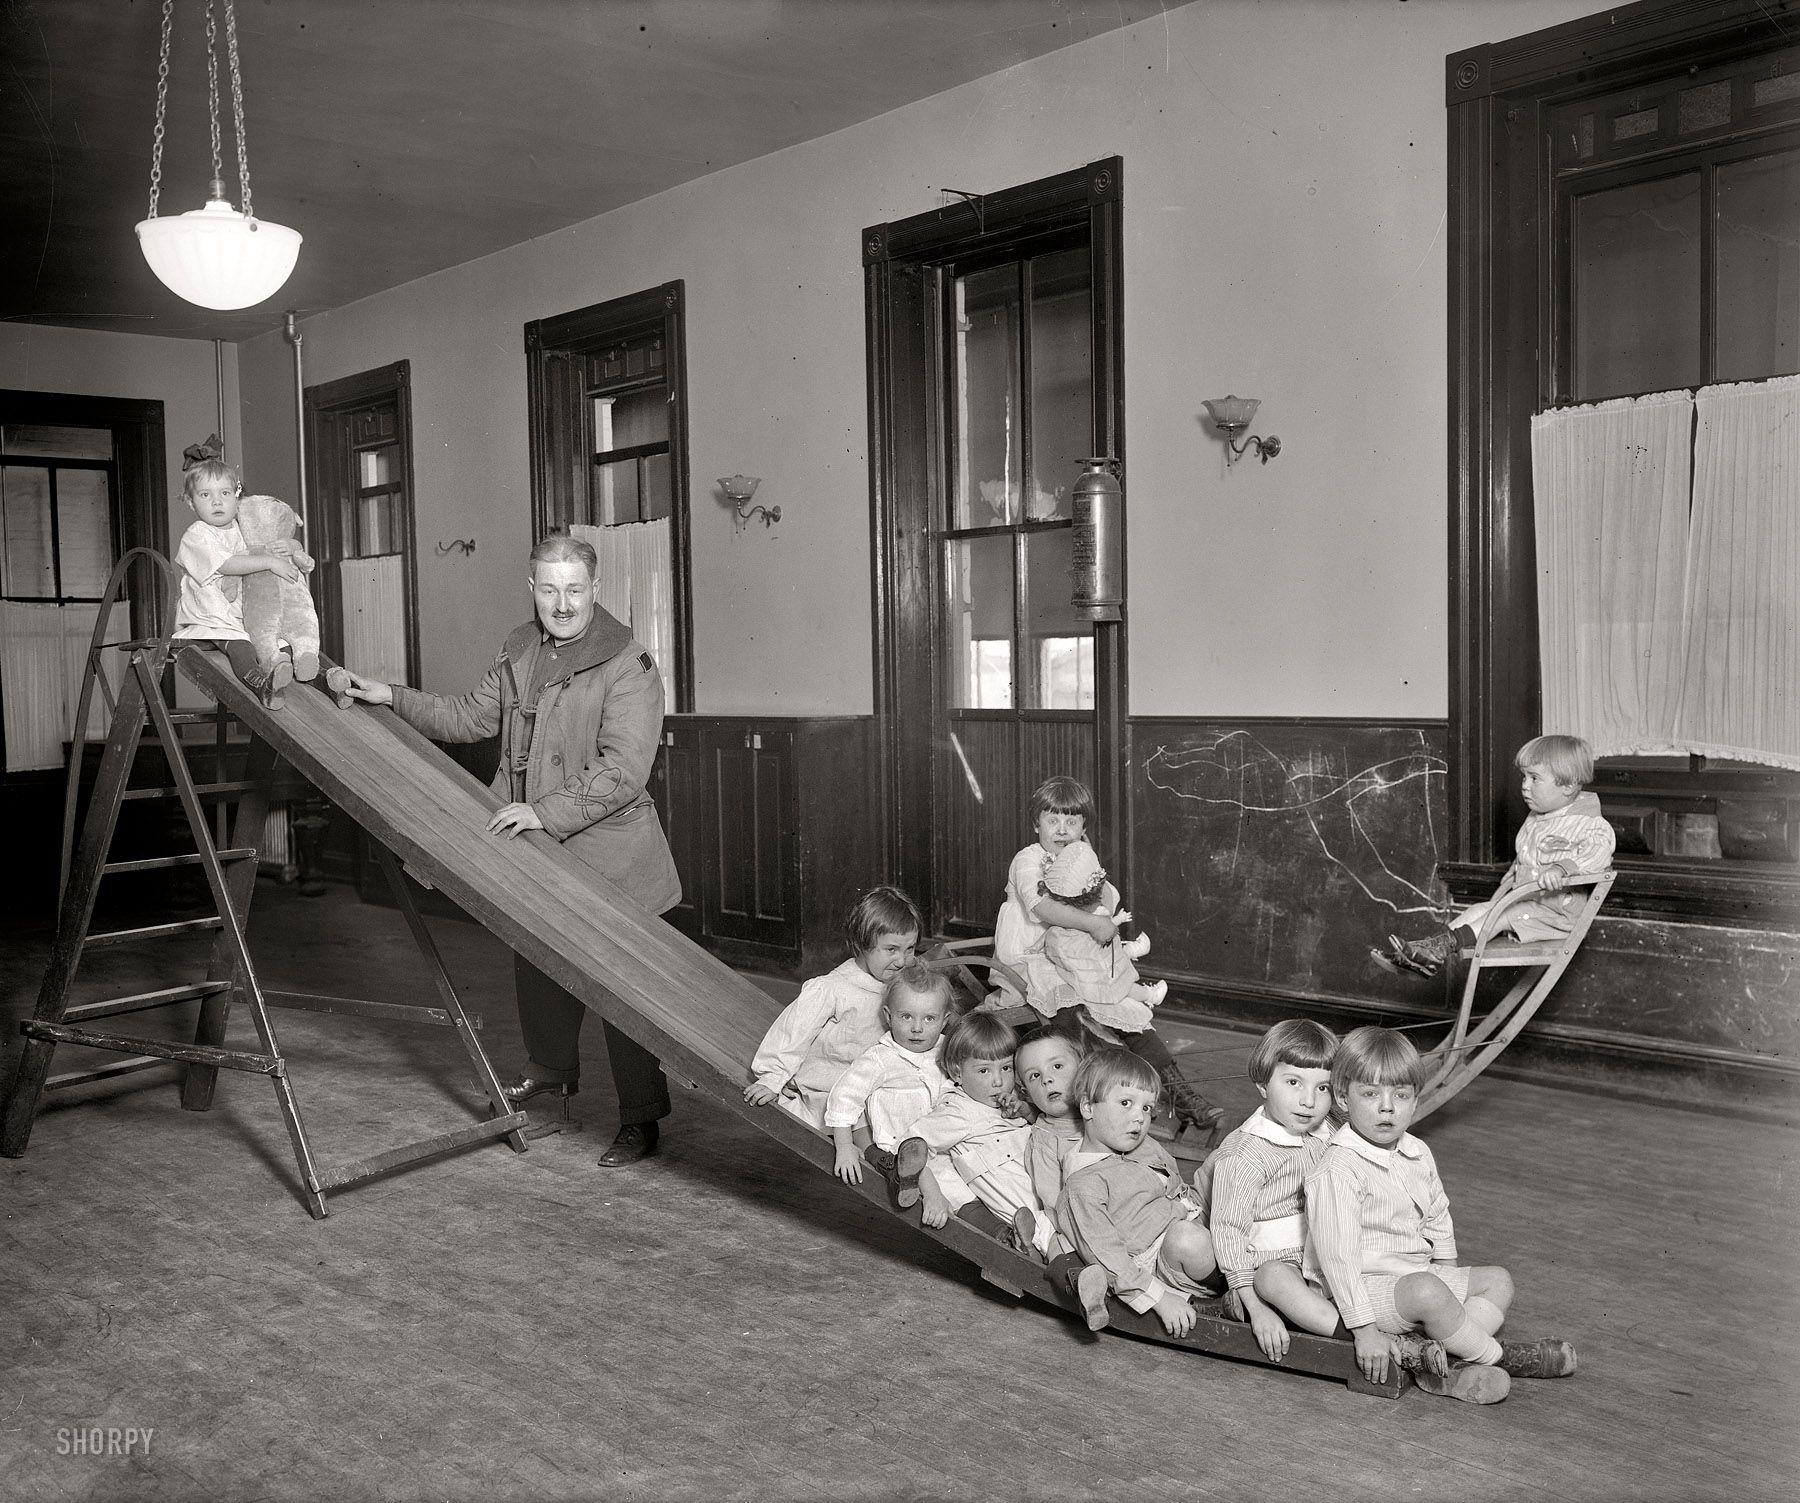 A Terrifying Asylum Tour Of The Past